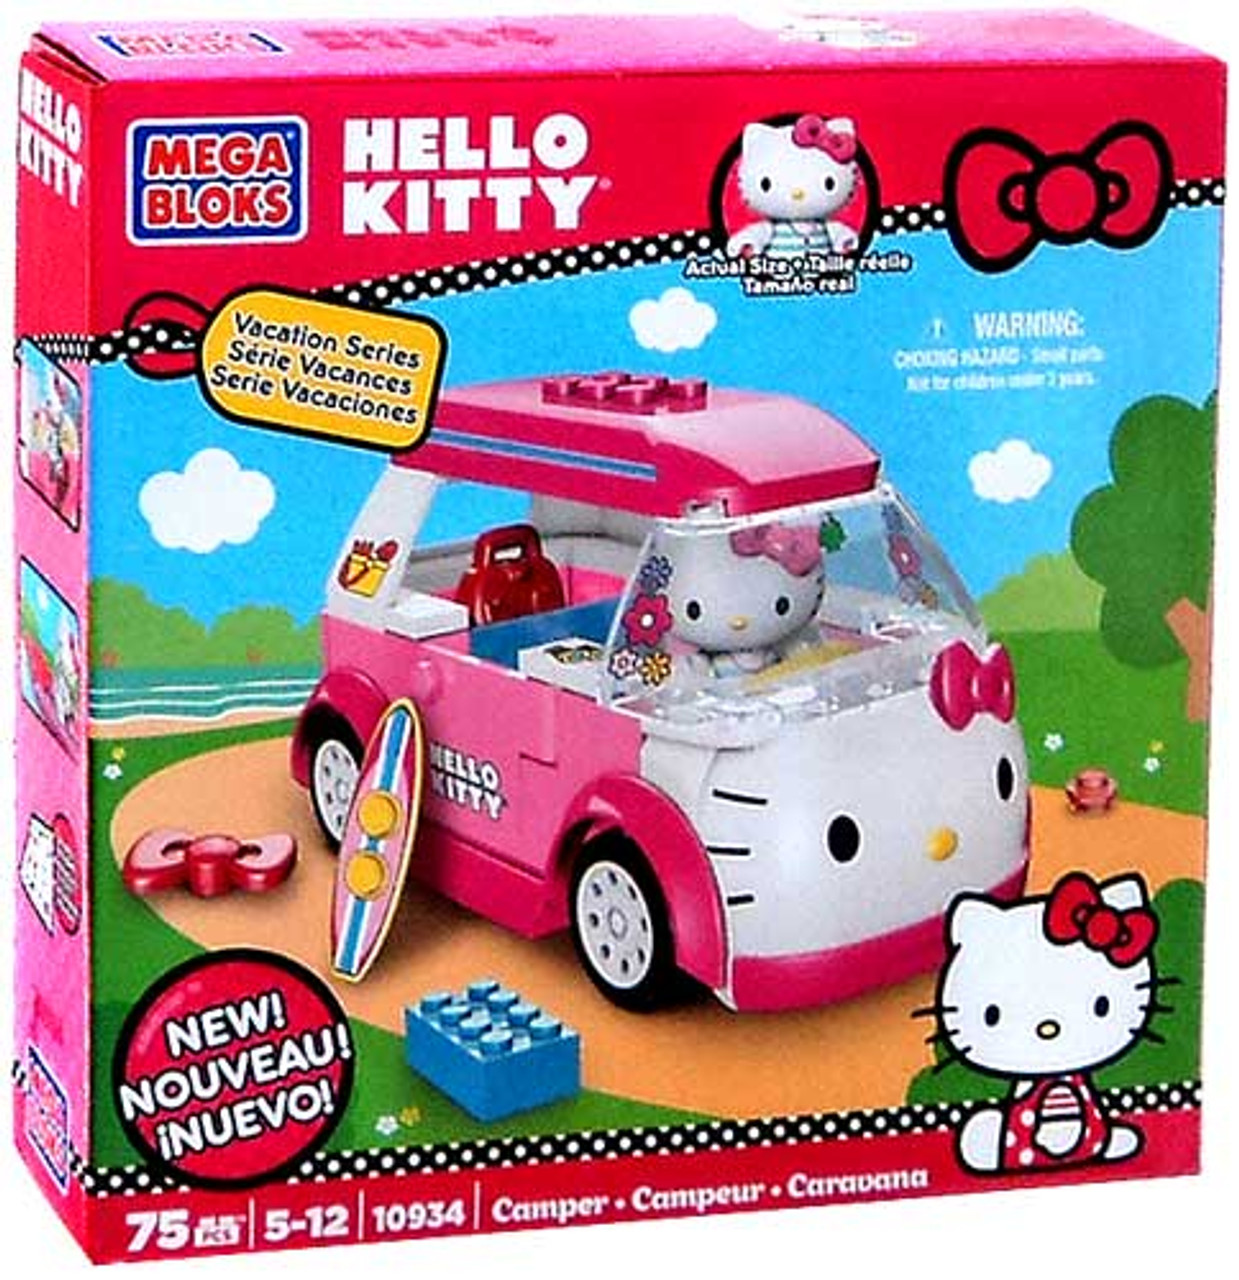 Mega Bloks Hello Kitty Vacation Series Camper Set #10934